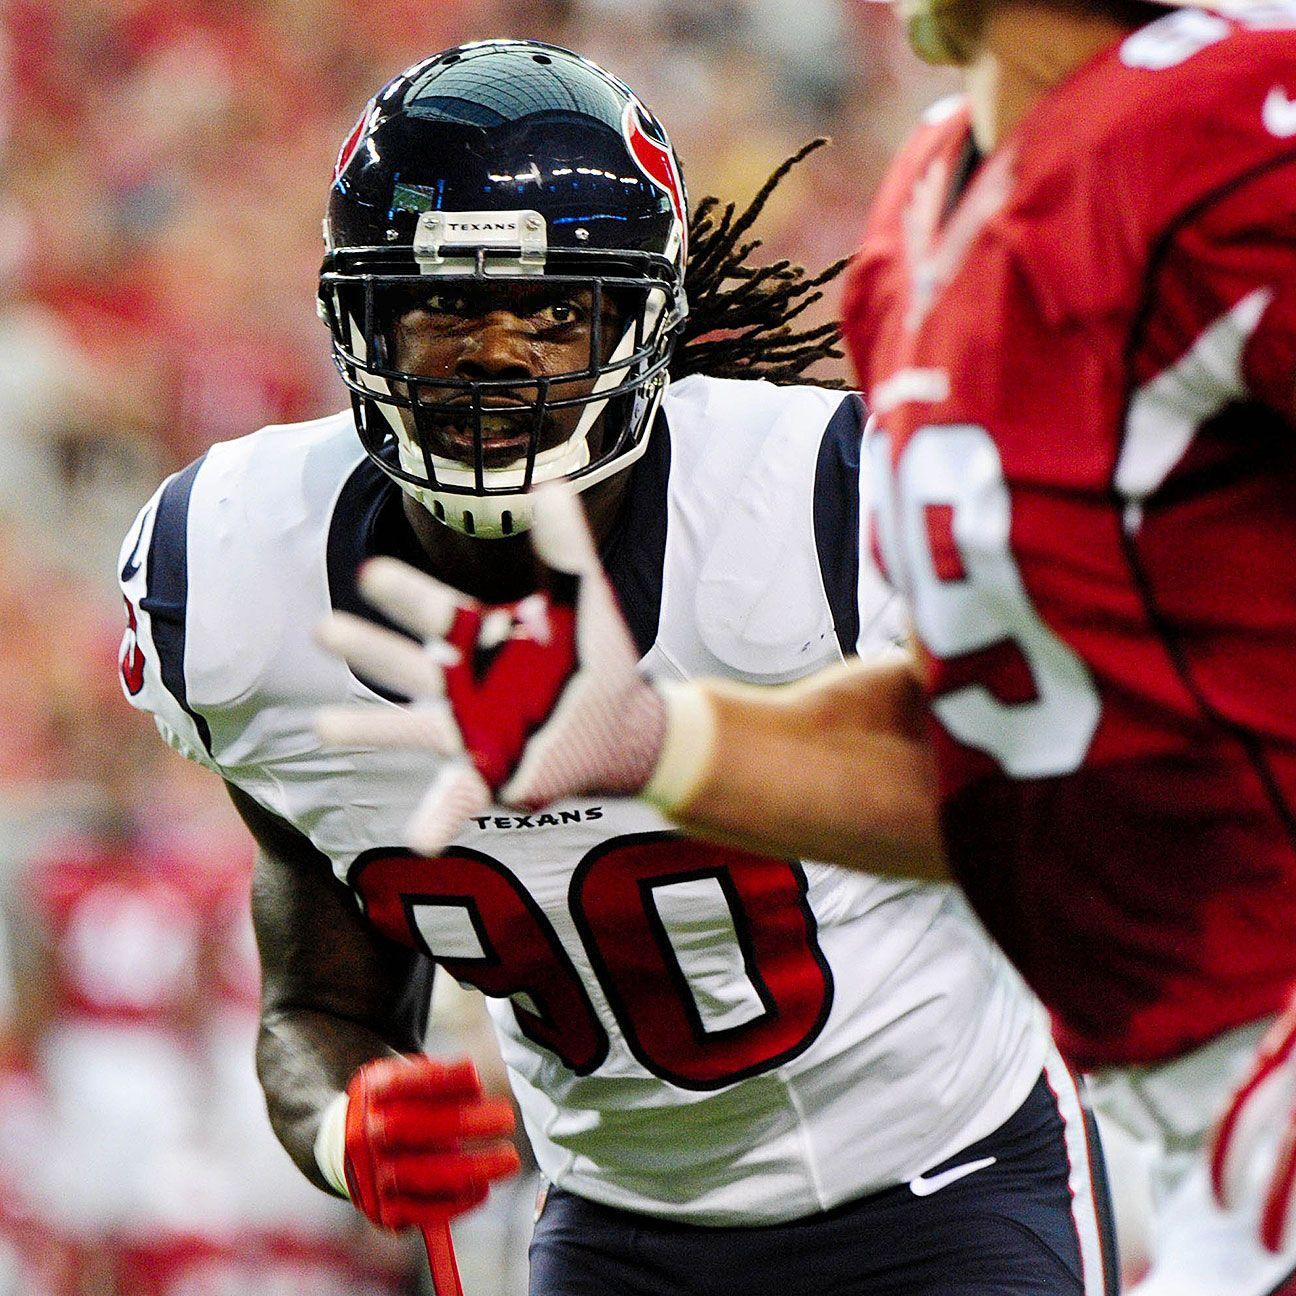 Houston Texans' Jadeveon Clowney Leads List Of Top Impact